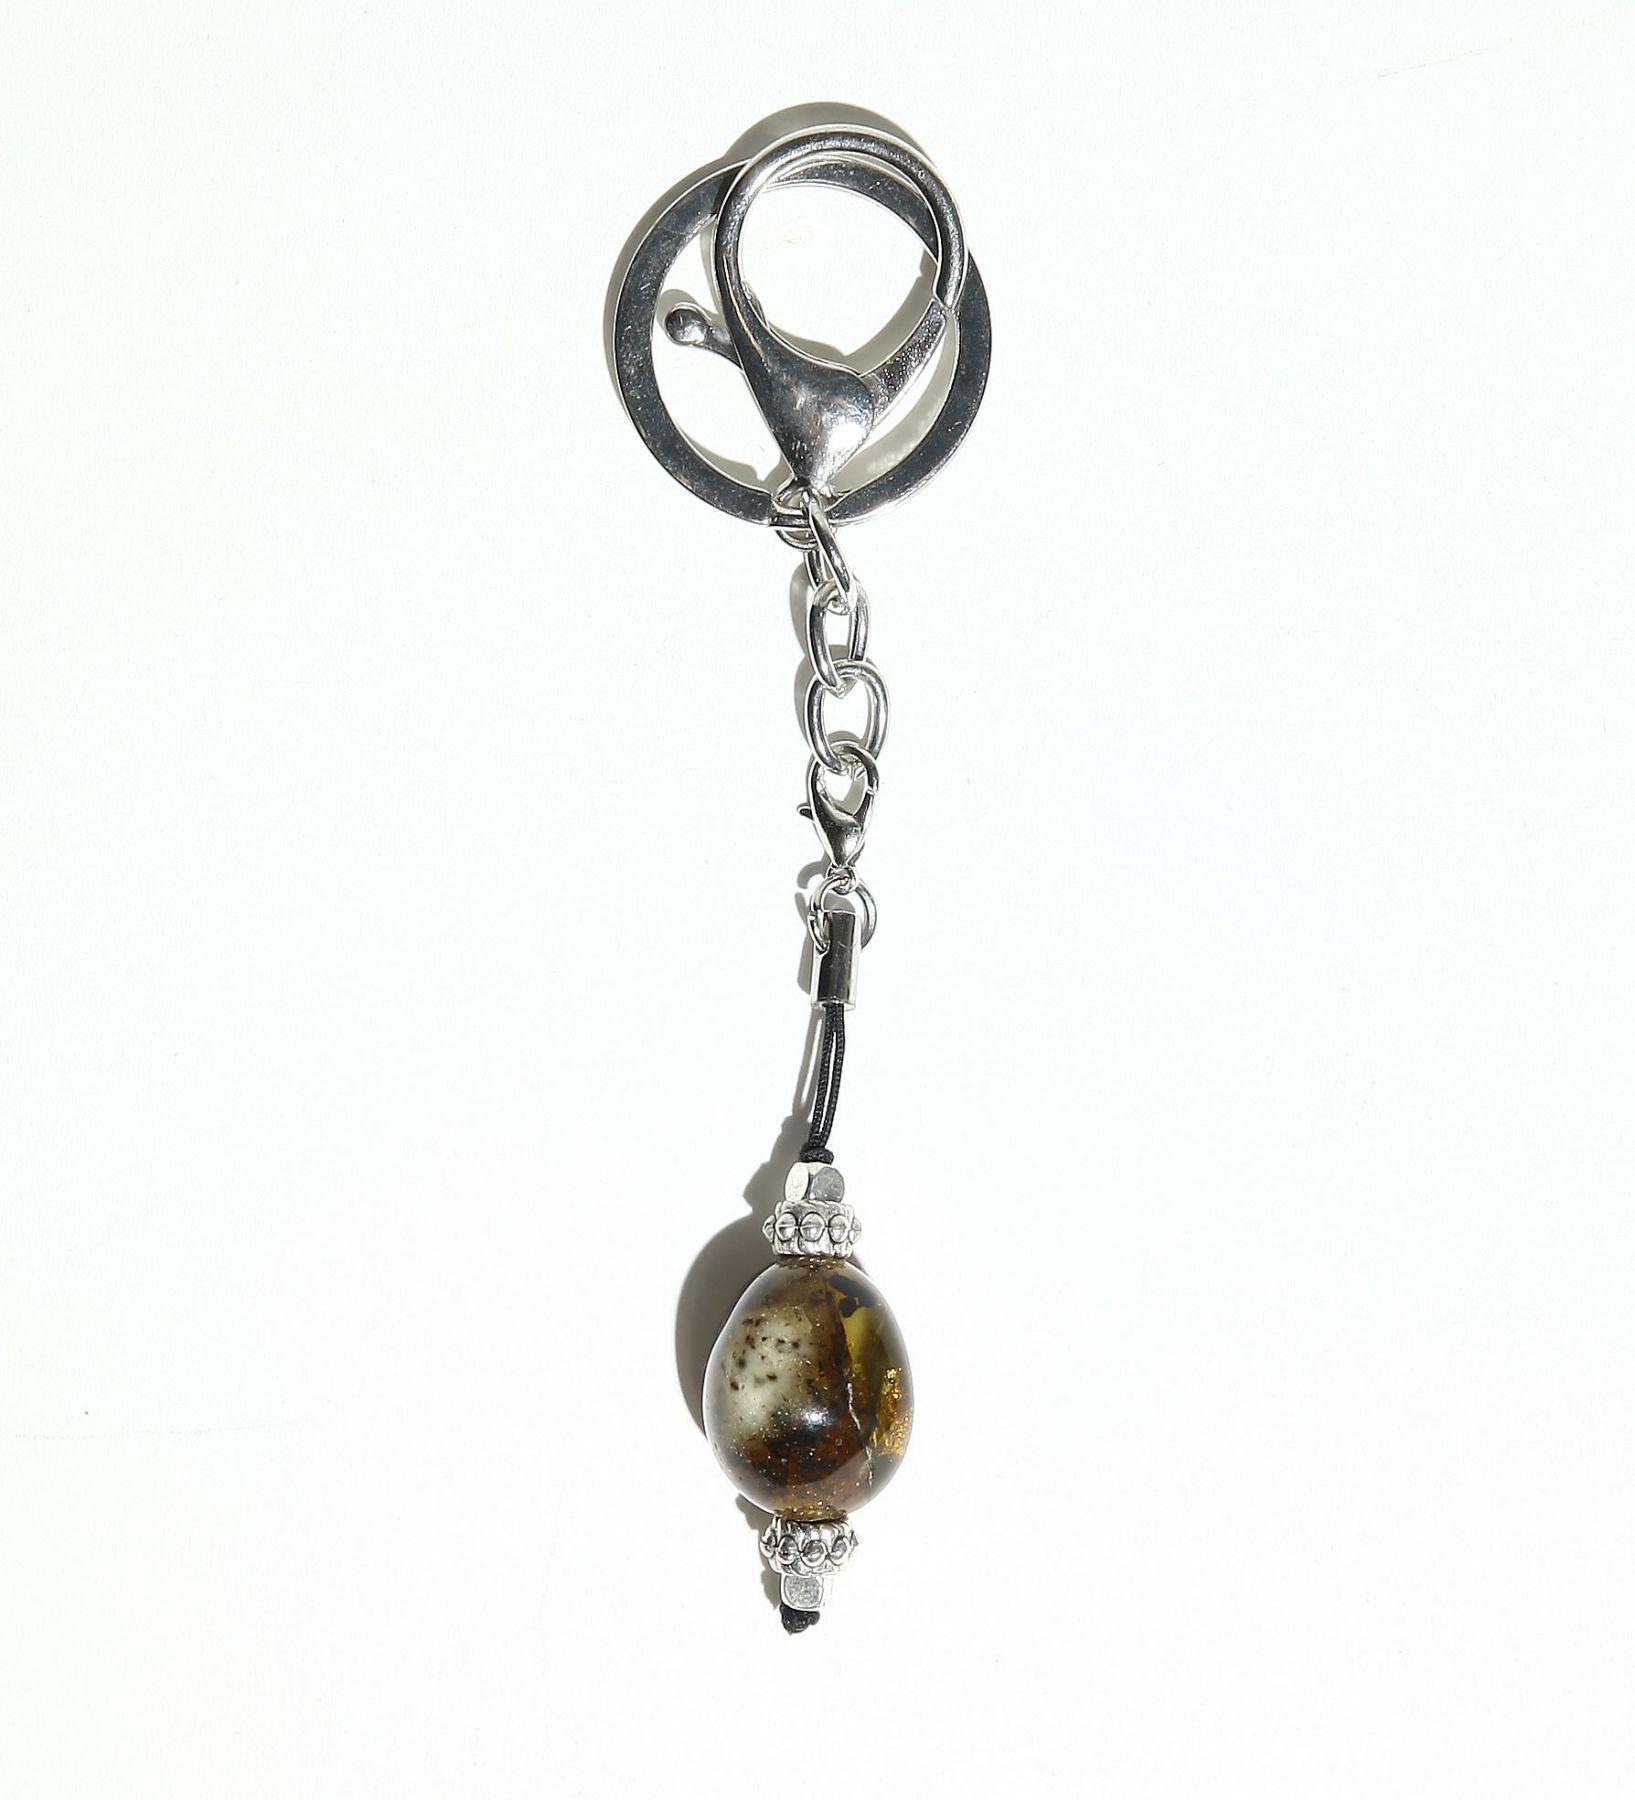 Брелок из калининградского янтаря оливкового цвета